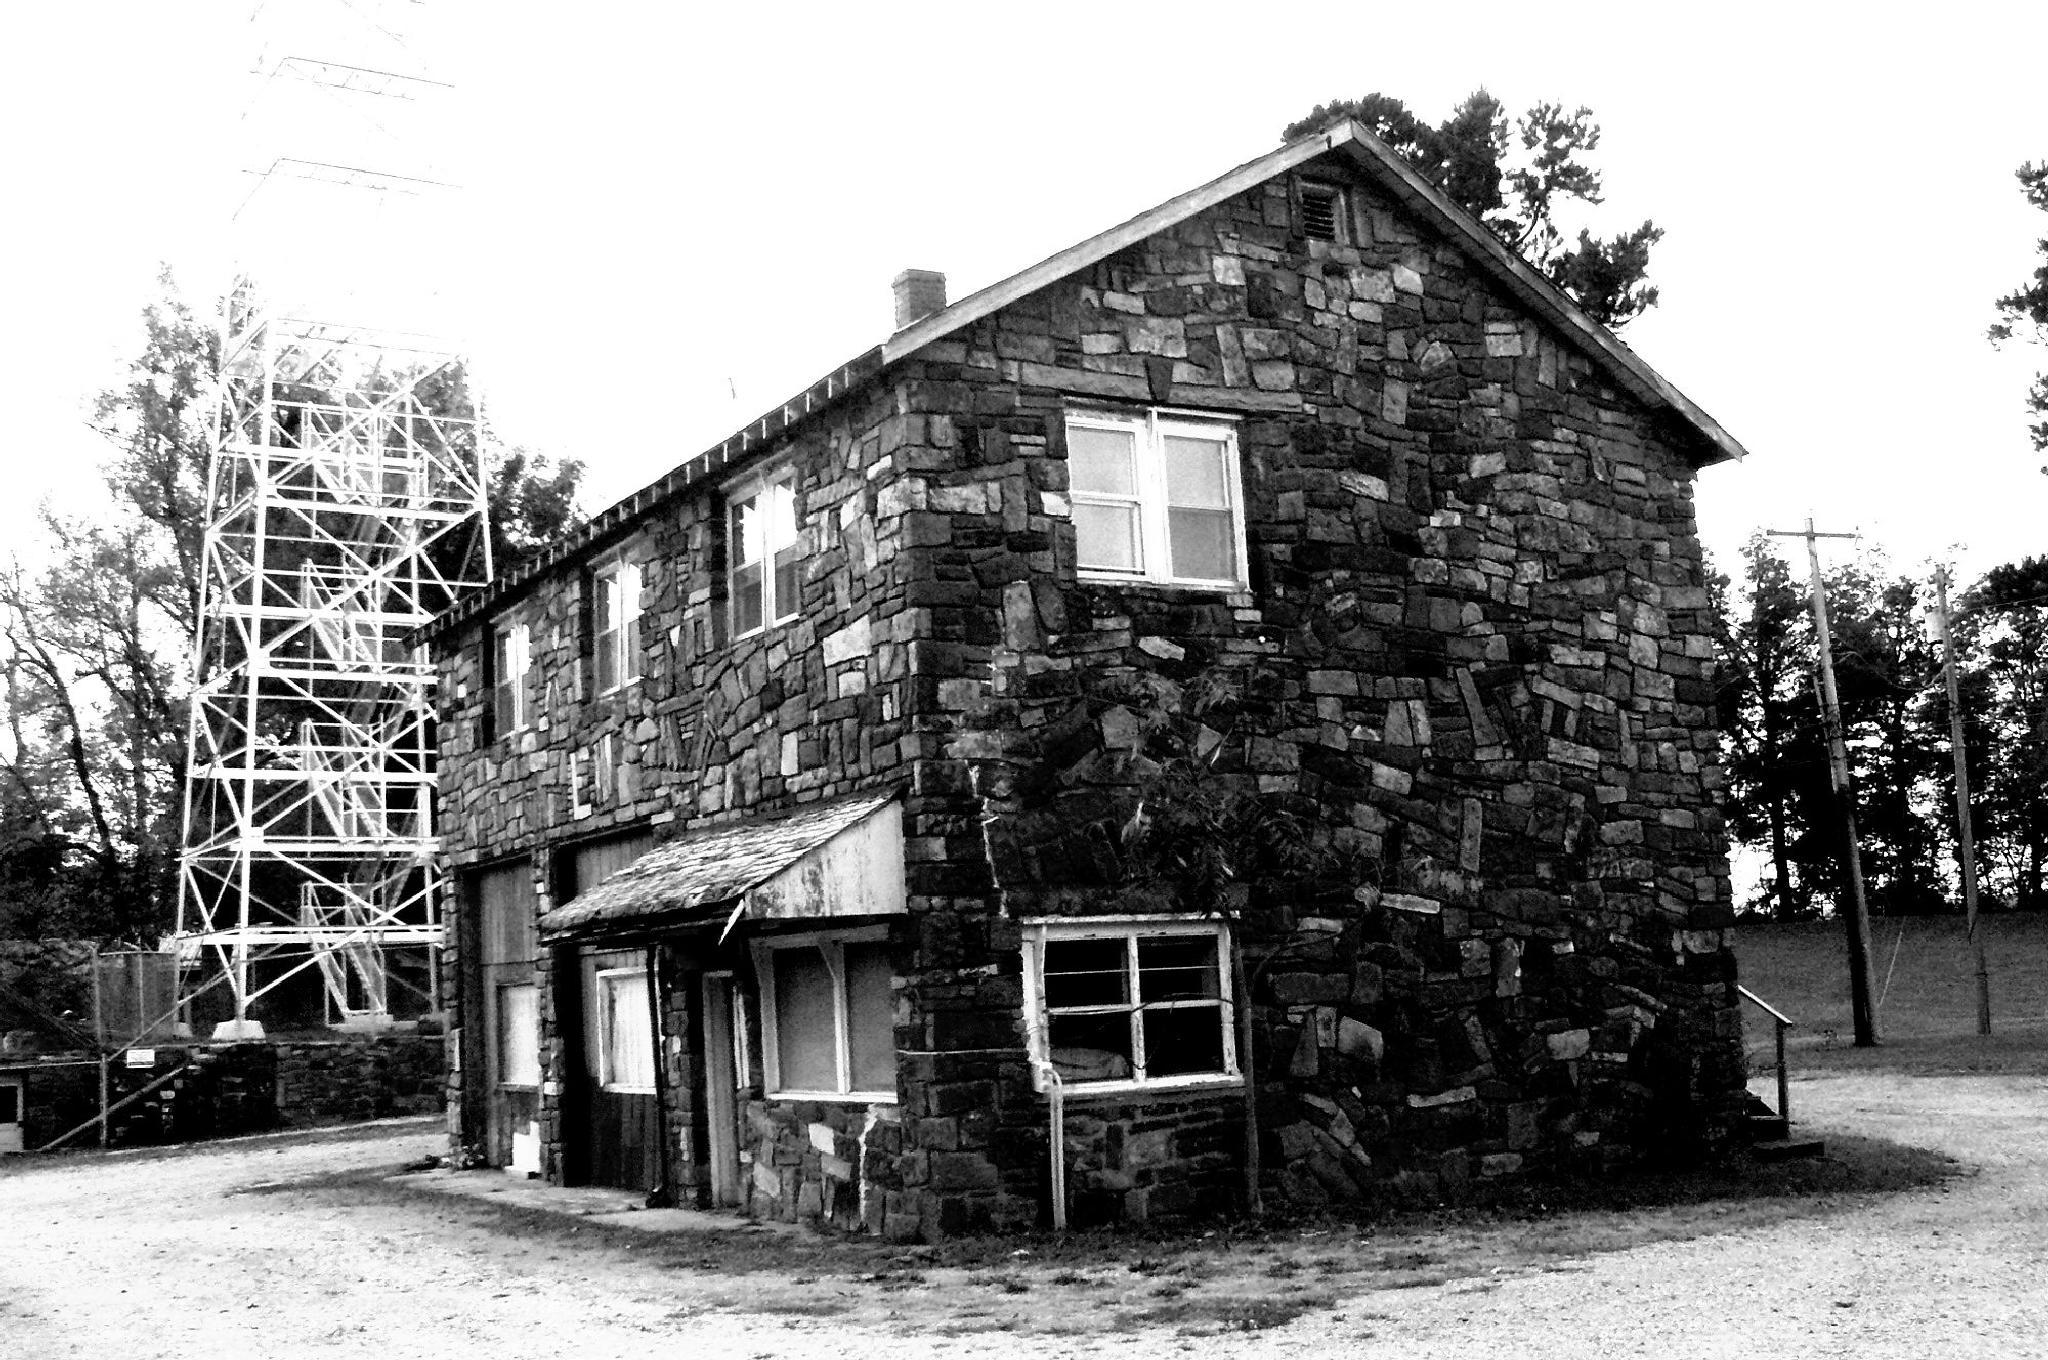 Abandoned by Lesley S. Blevins